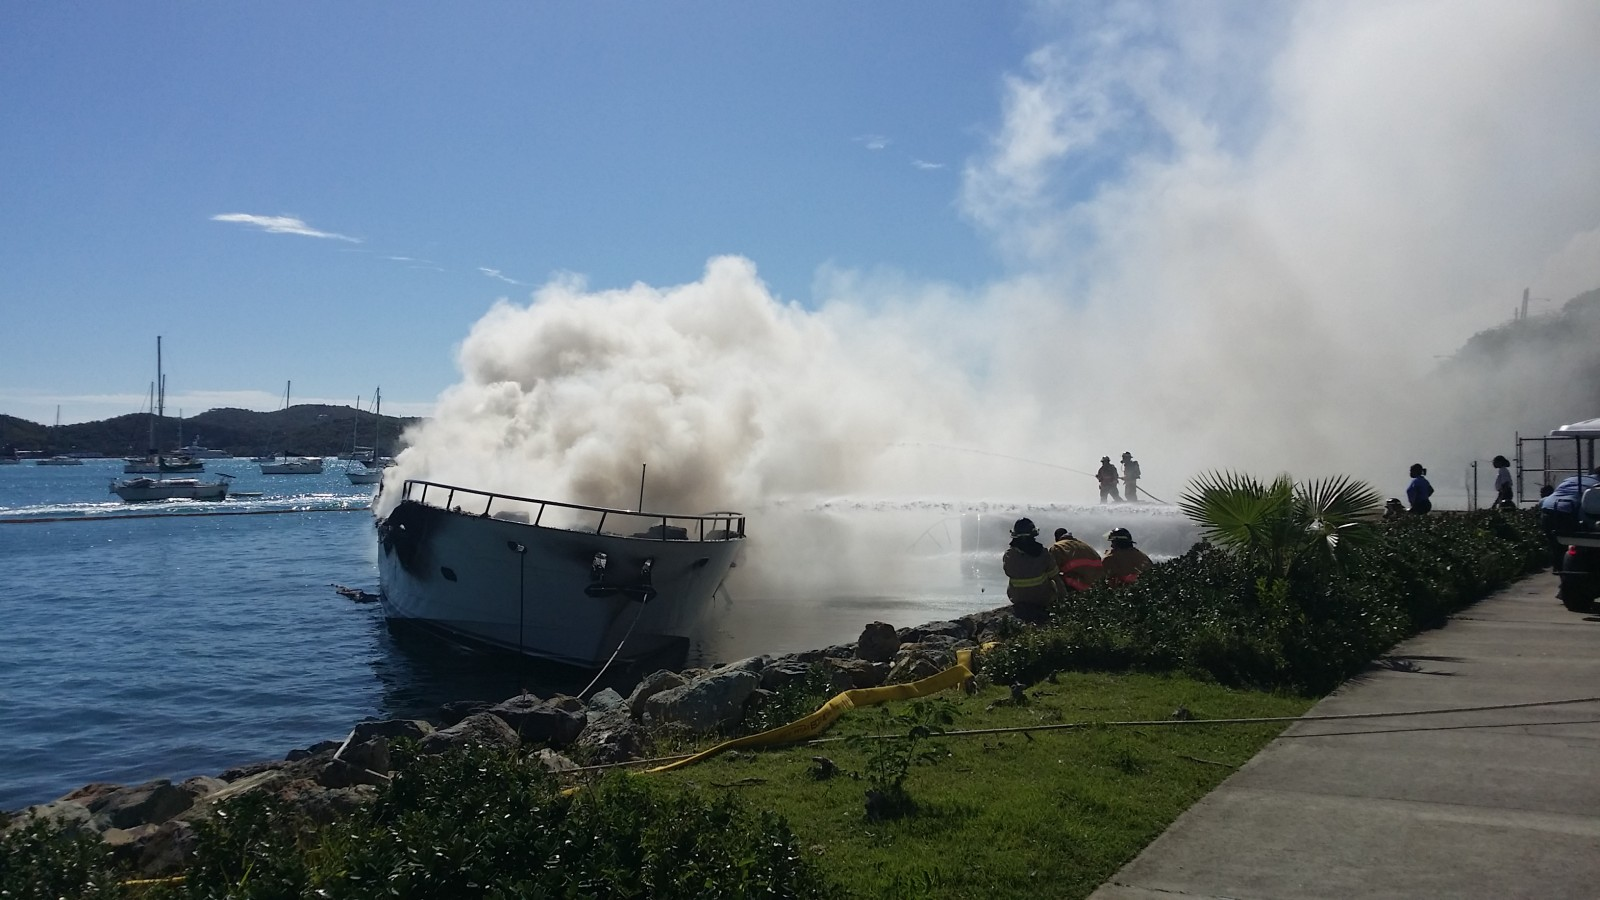 Yacht Haven Grande fire Dean Barnes photo credit (9)